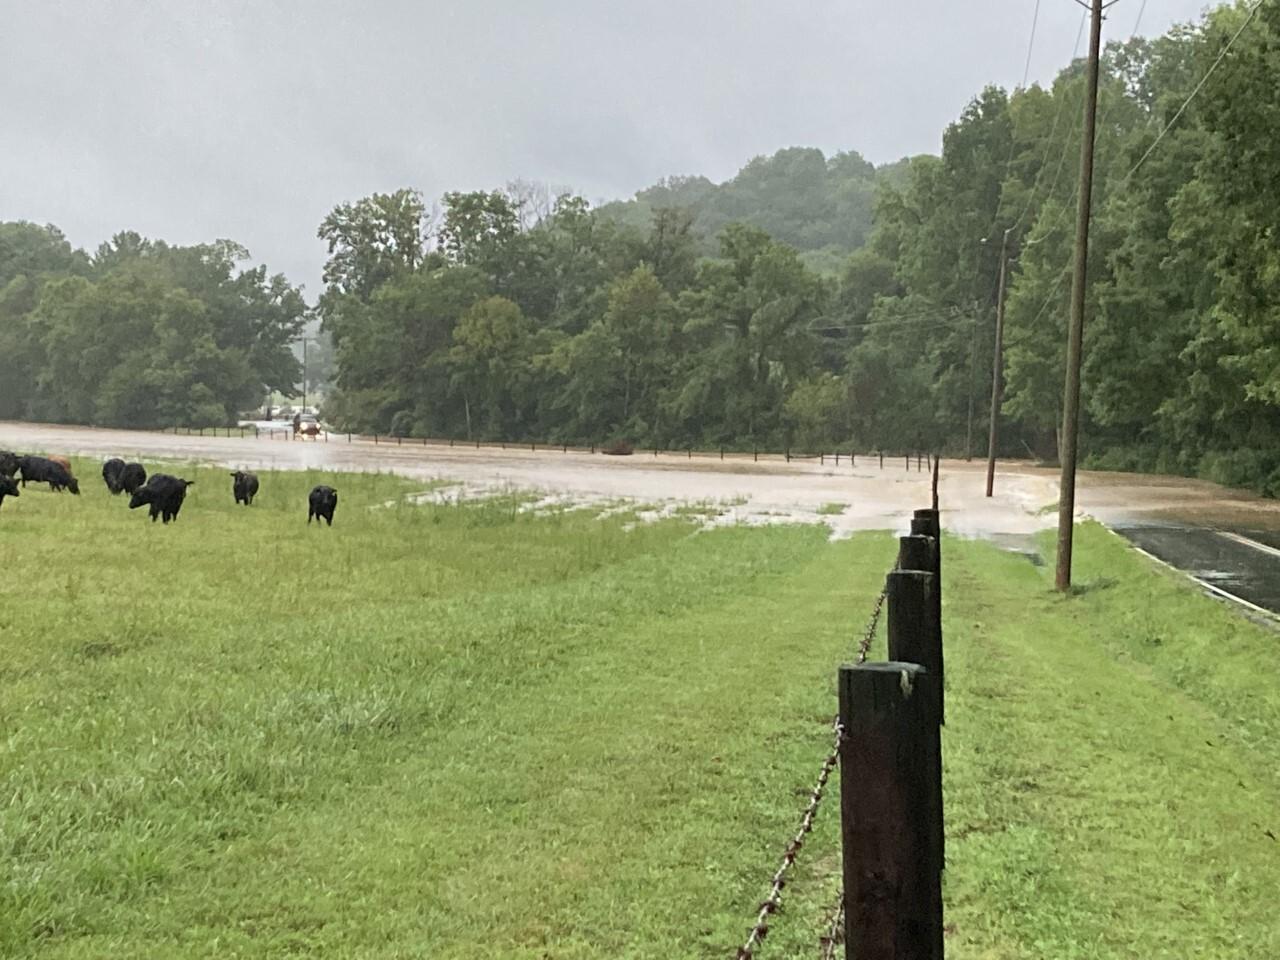 dickson county flooding - 8/21/21